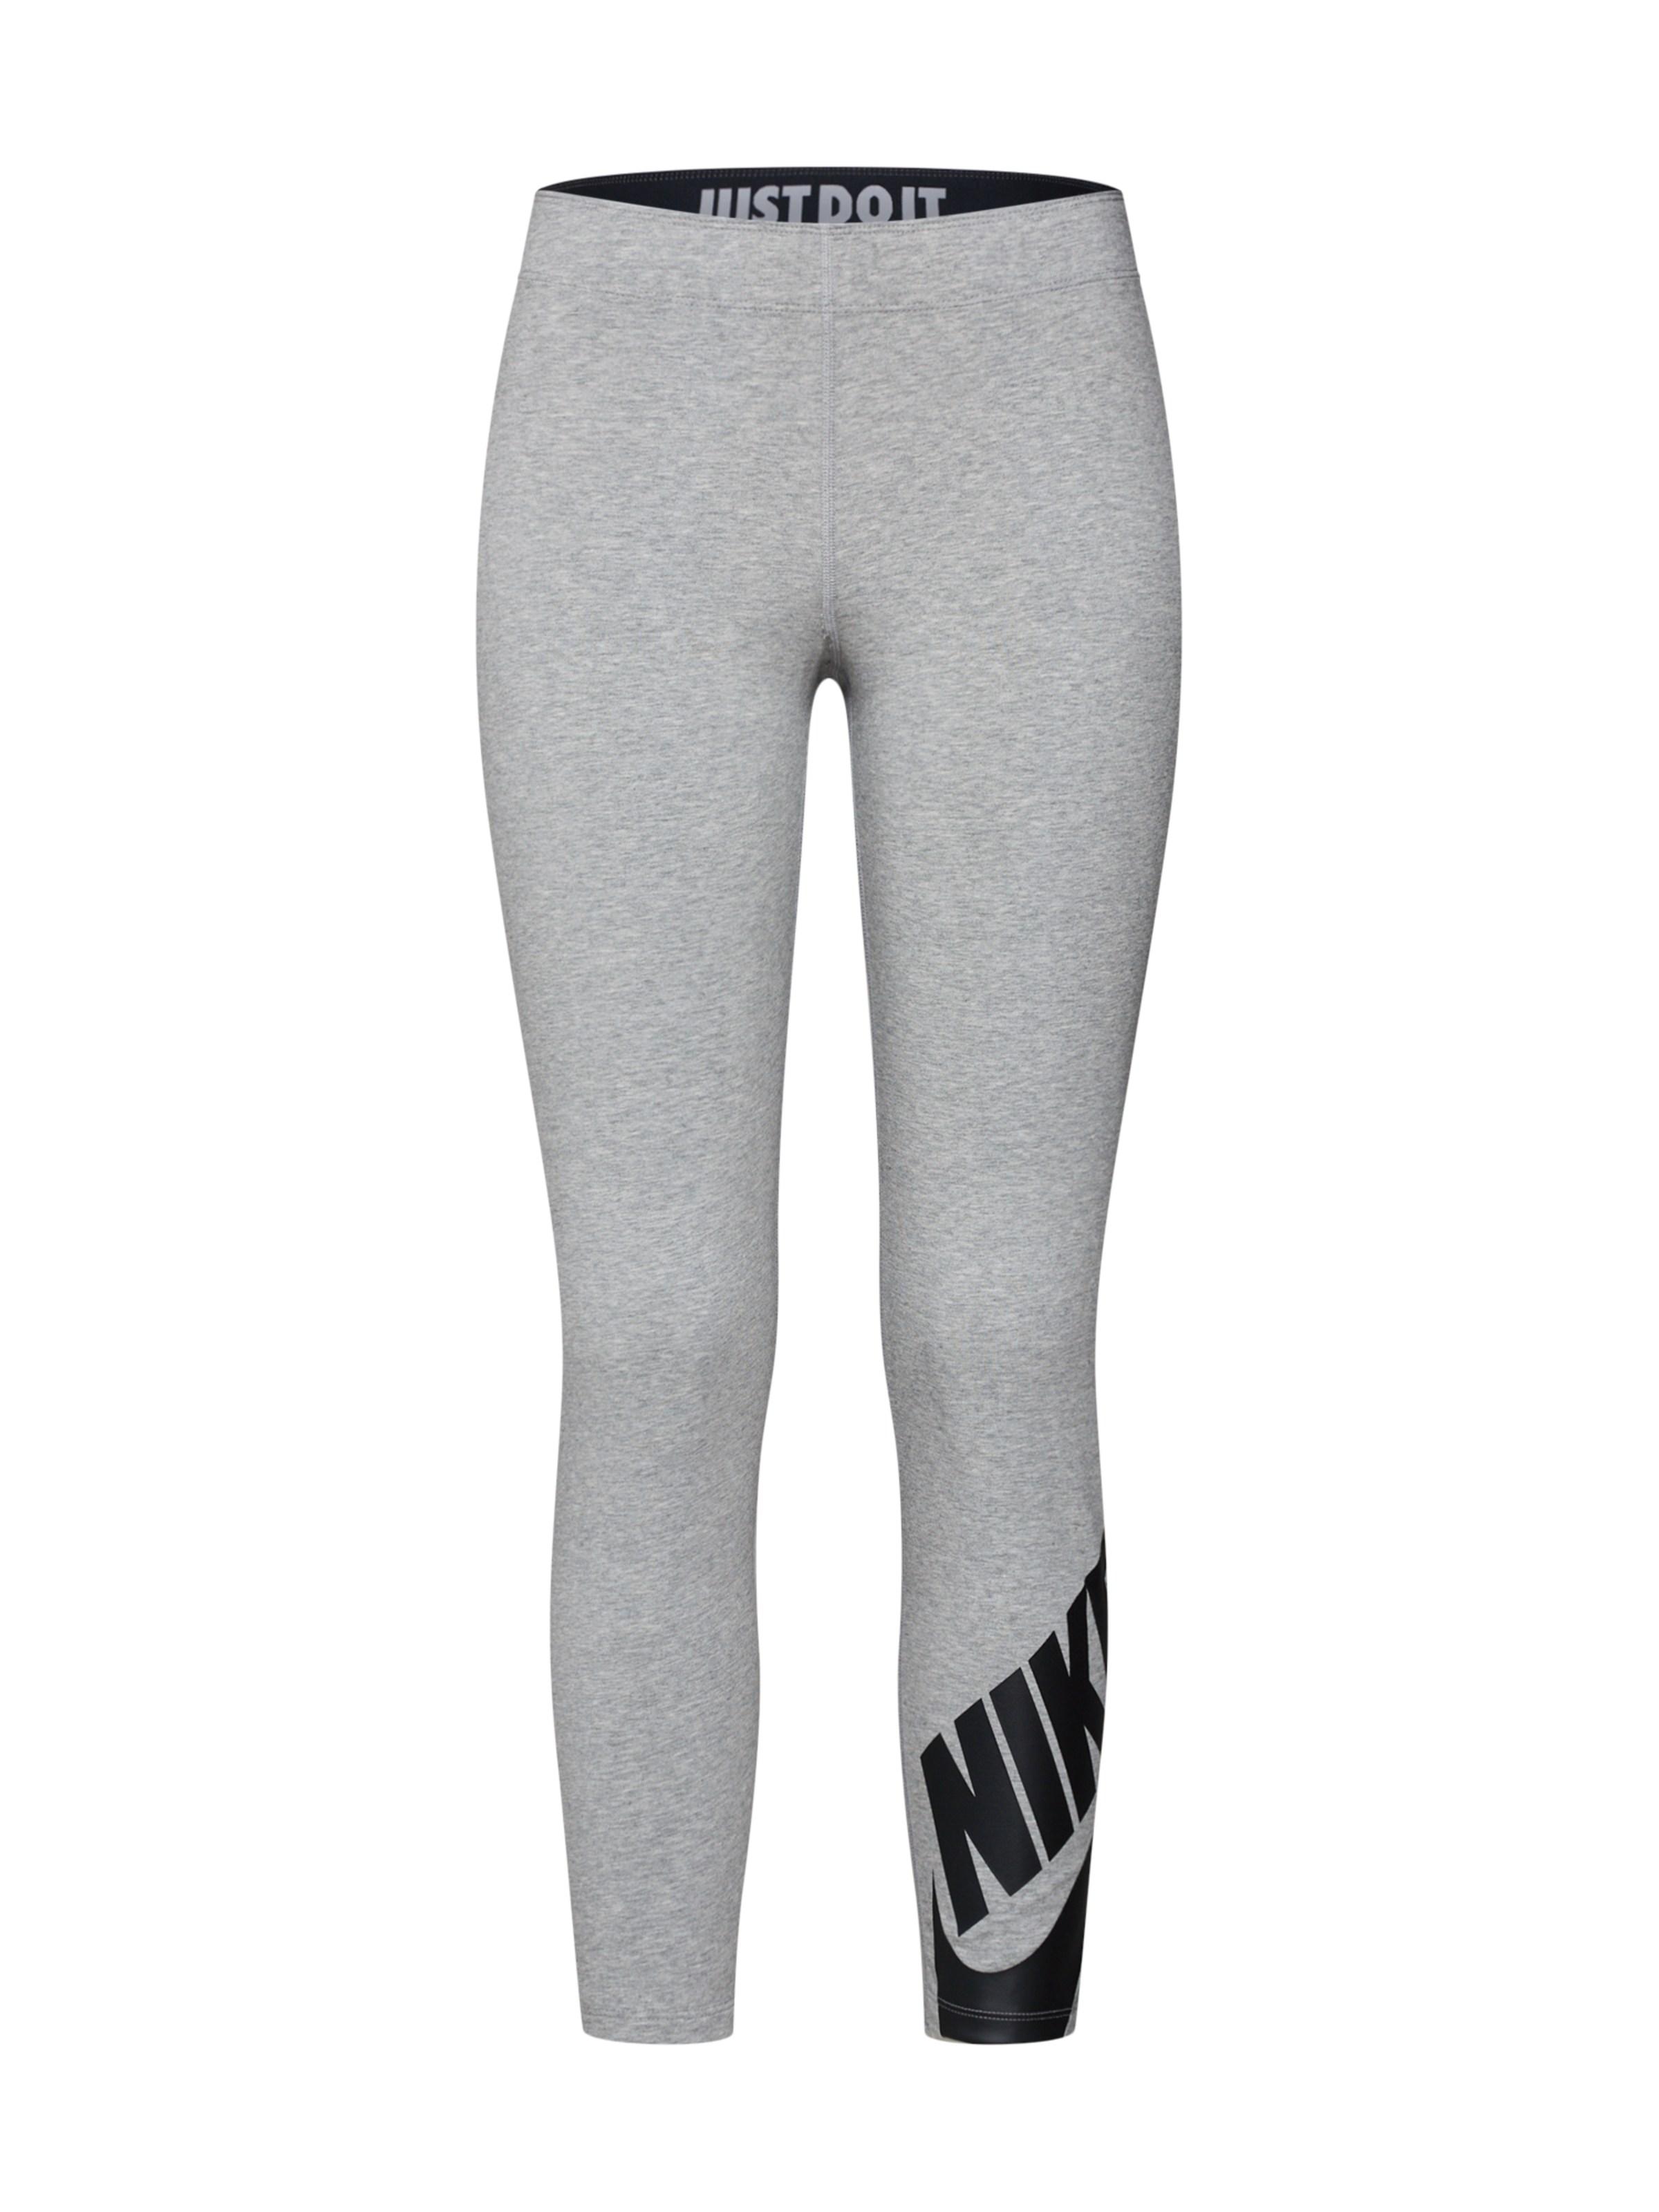 b901462fbafa Nike Sportswear Legíny  W NSW LEGASEE LGGNG 7 8 FUTURA  šedá - Glami.cz